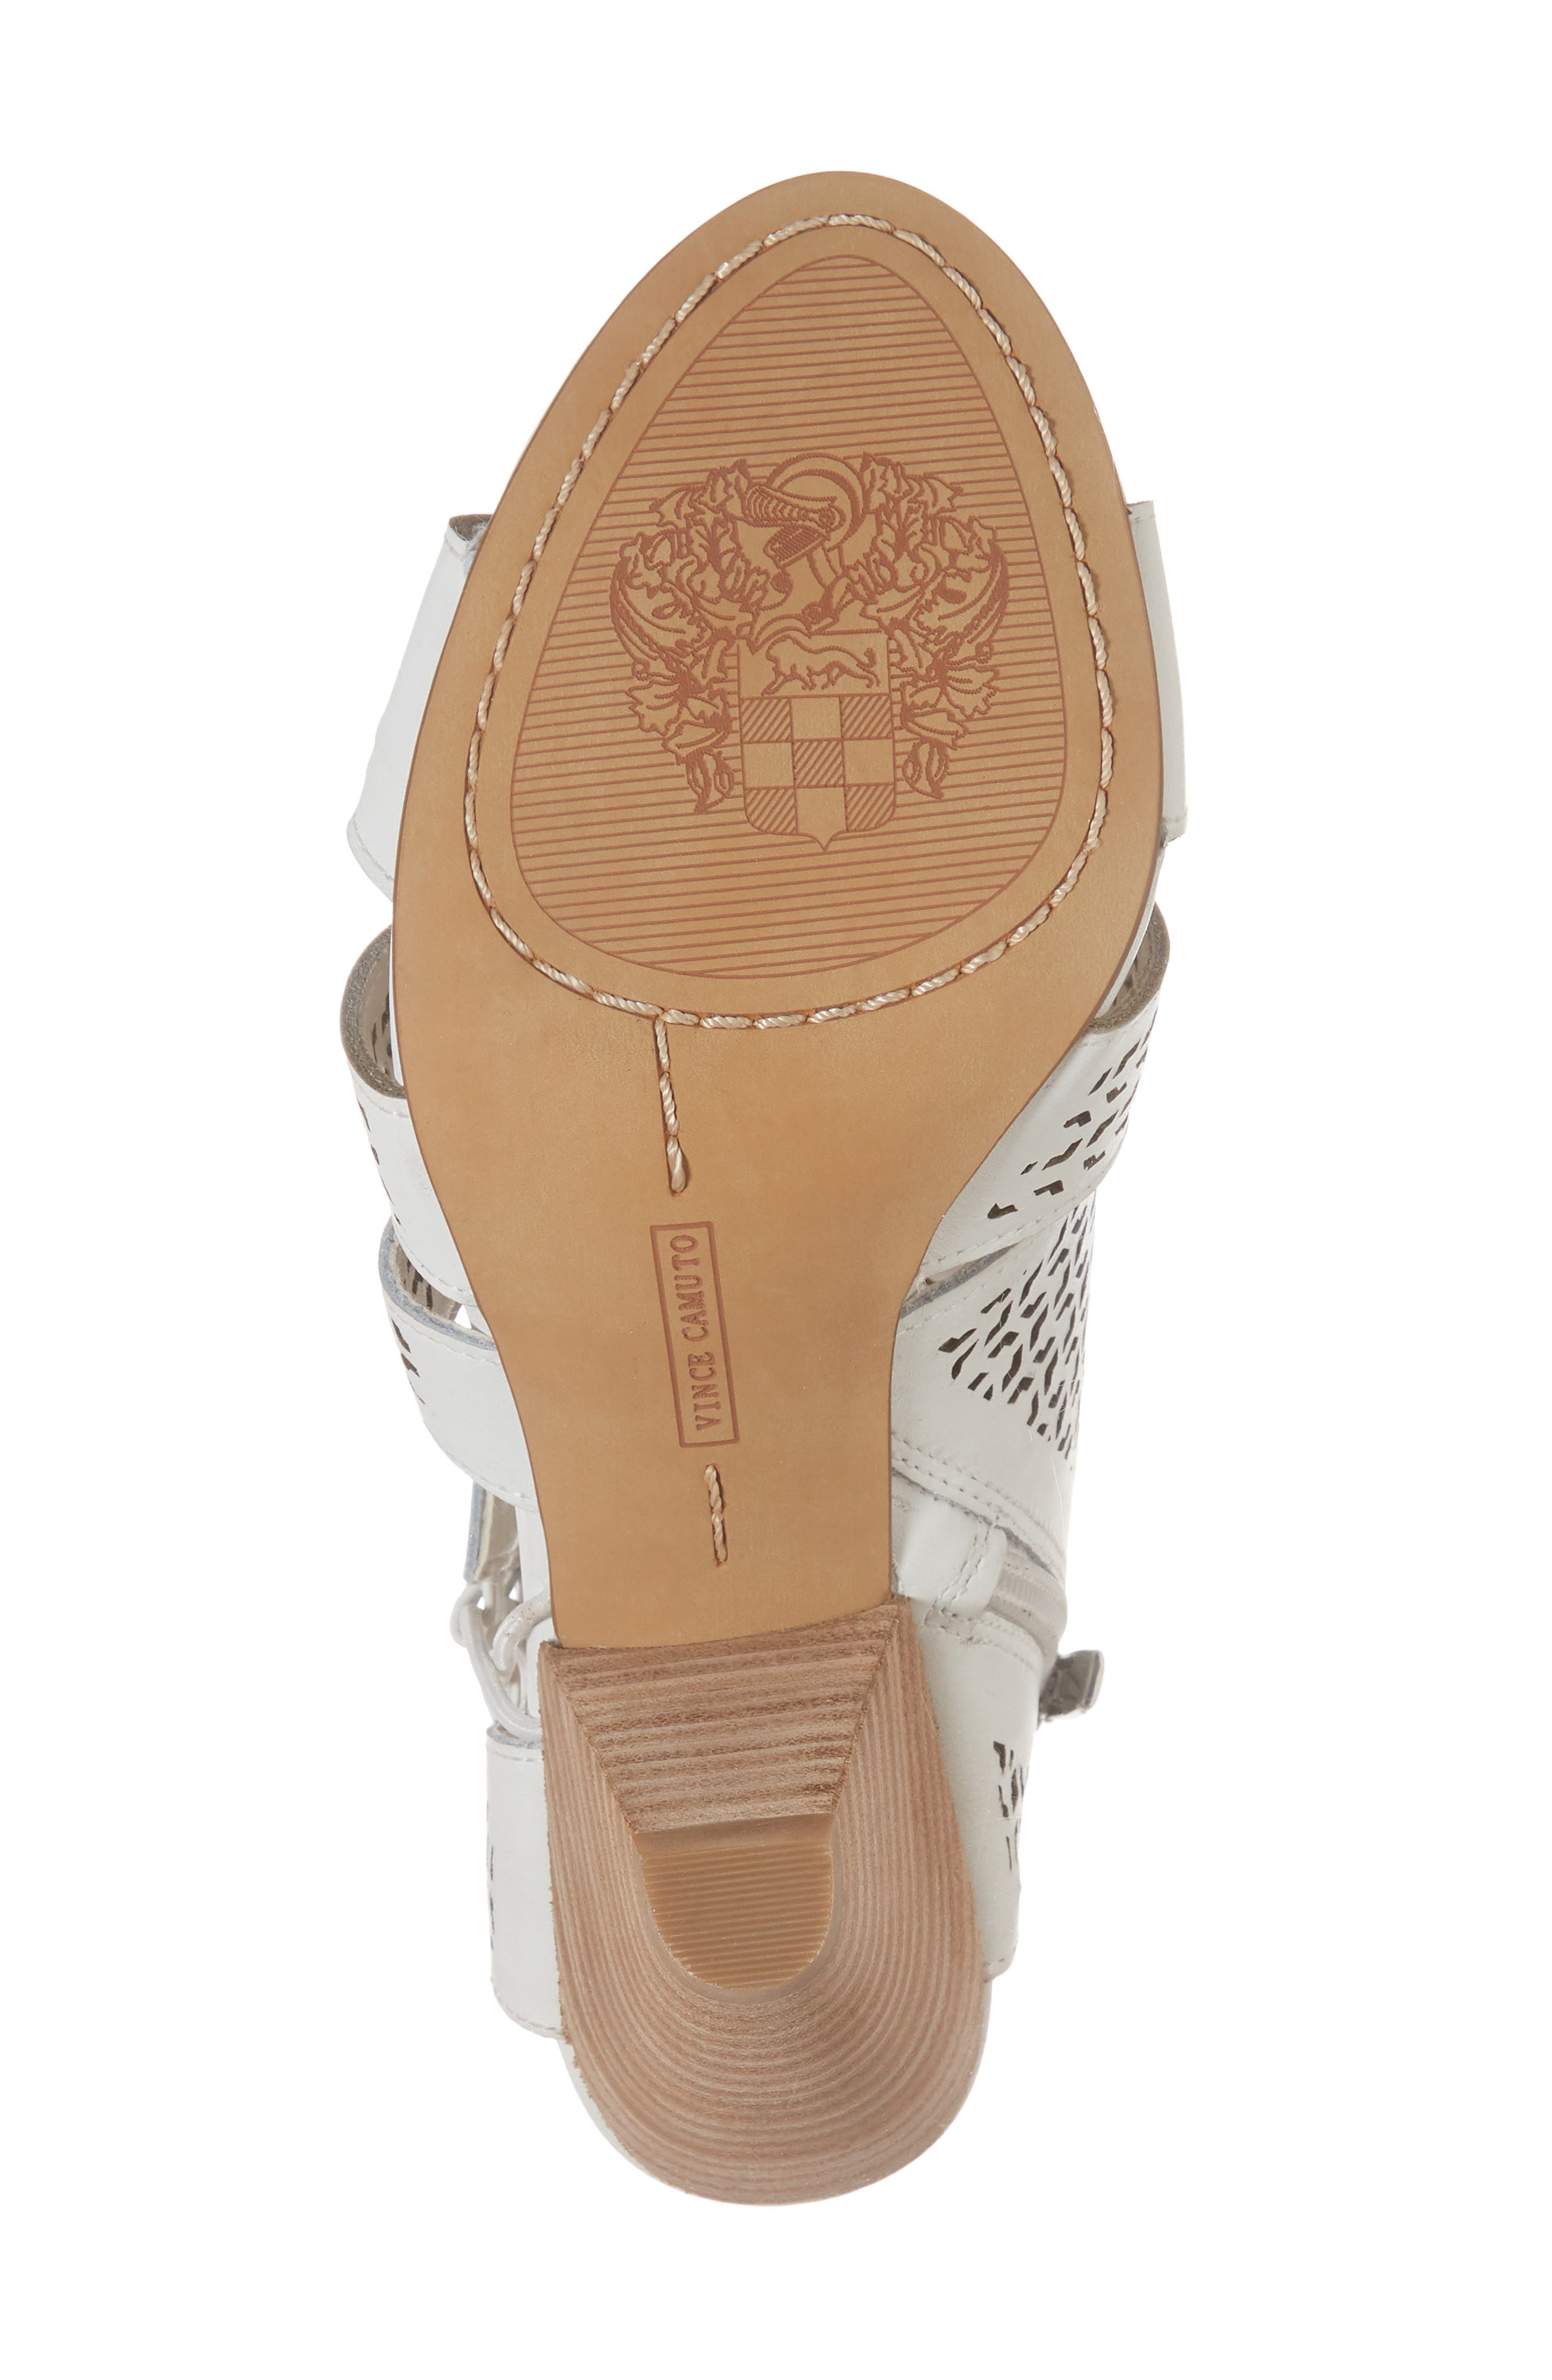 Esten Perforated Sandal,                             Alternate thumbnail 6, color,                             Pure Leather